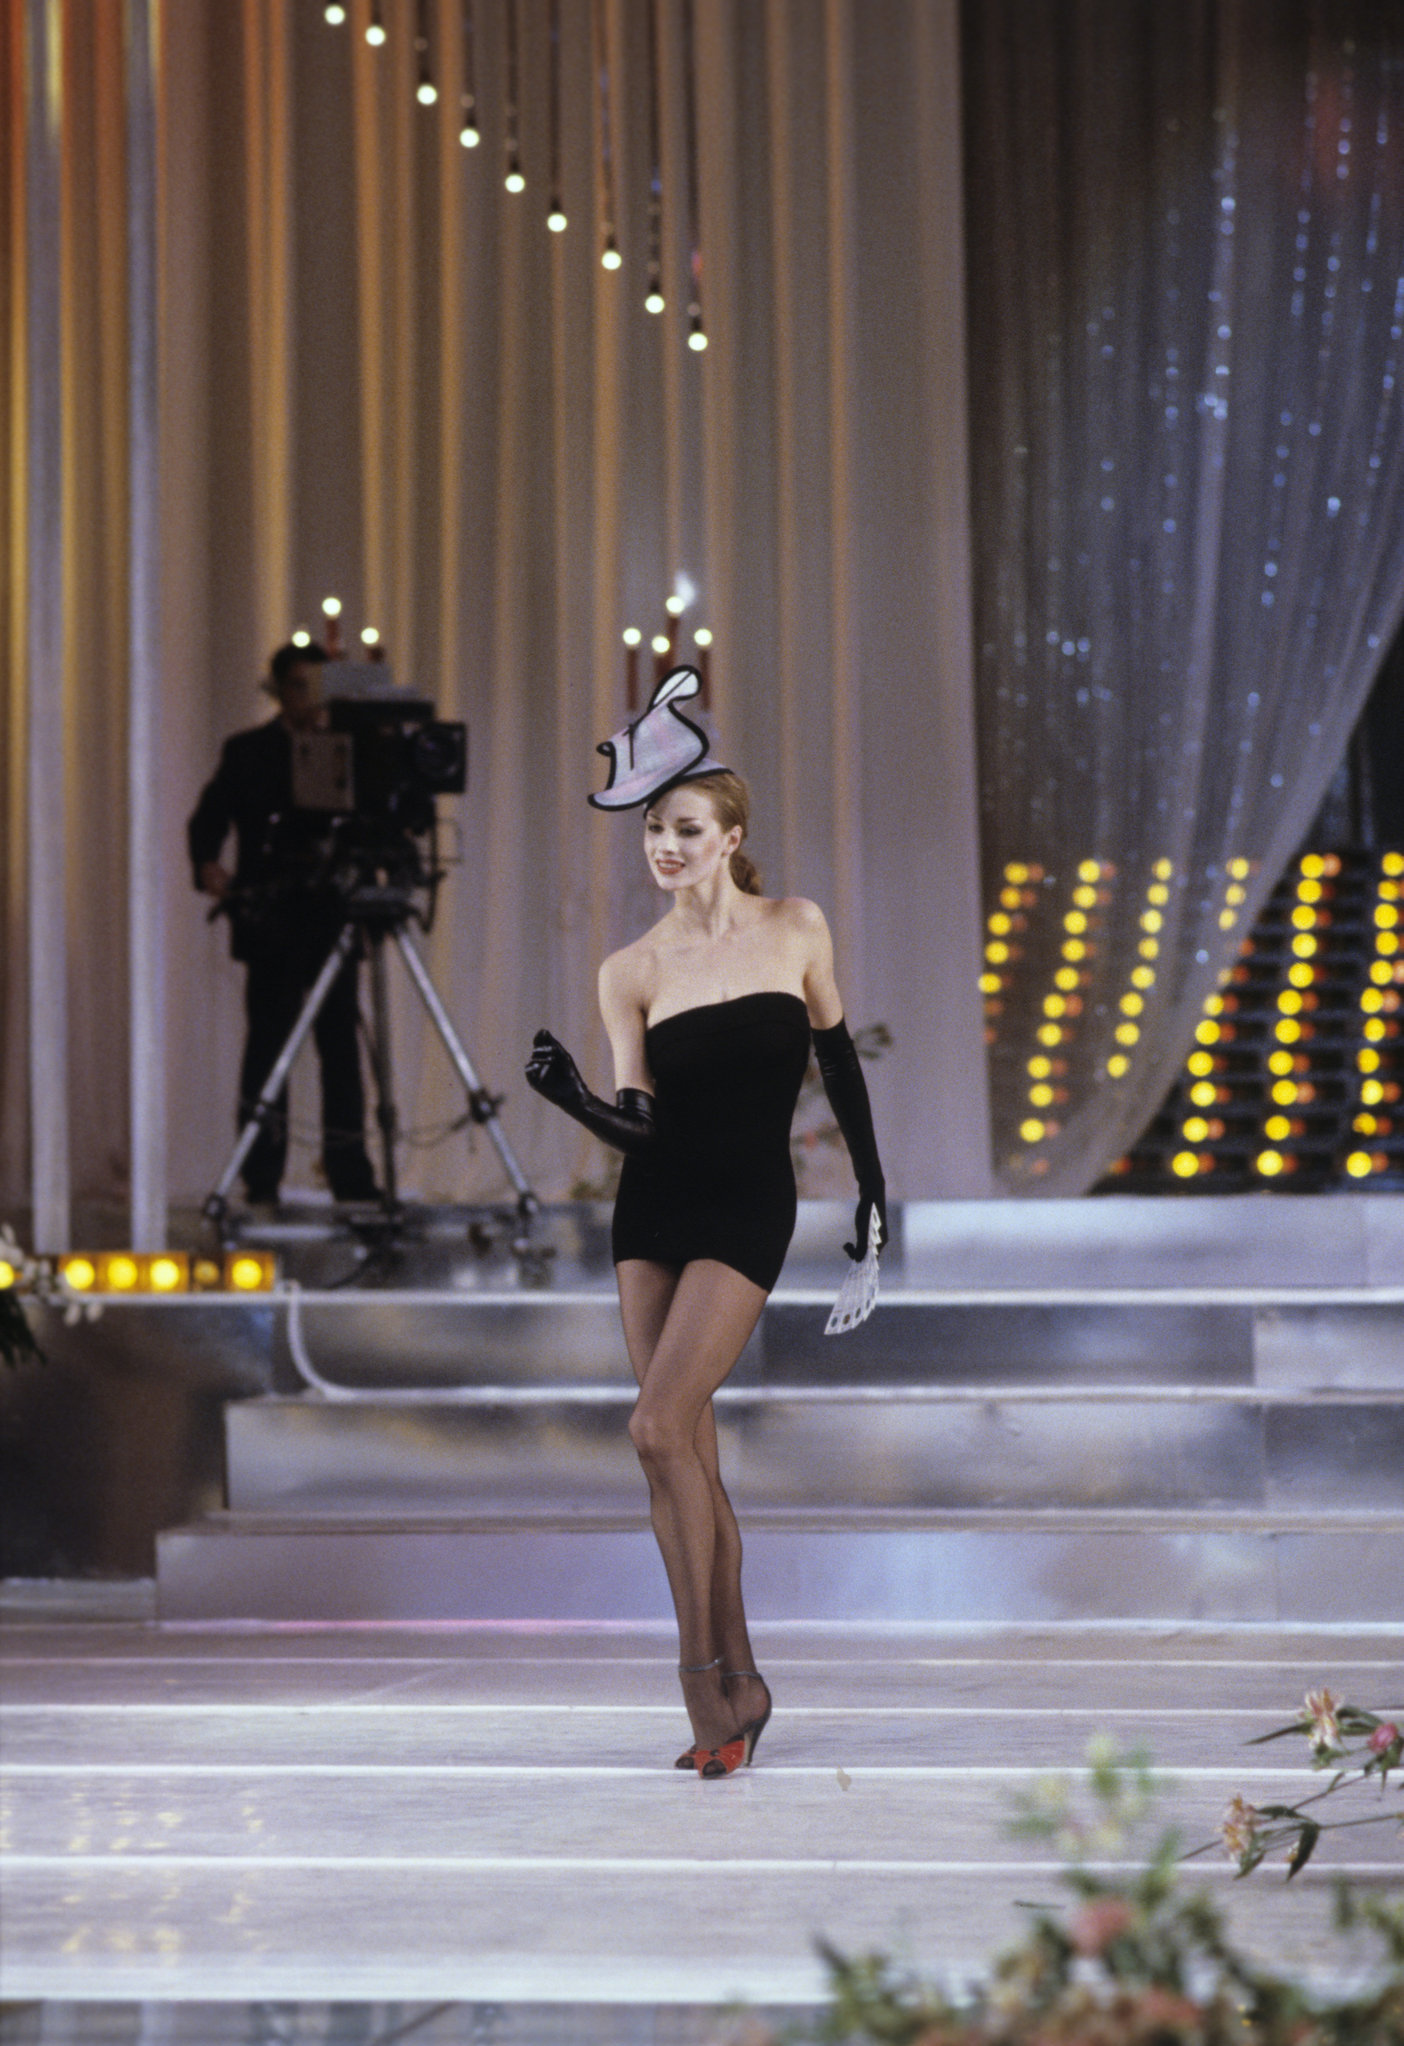 Miss URSS - 89 (3ème place) Ekaterina Meshcheryakova